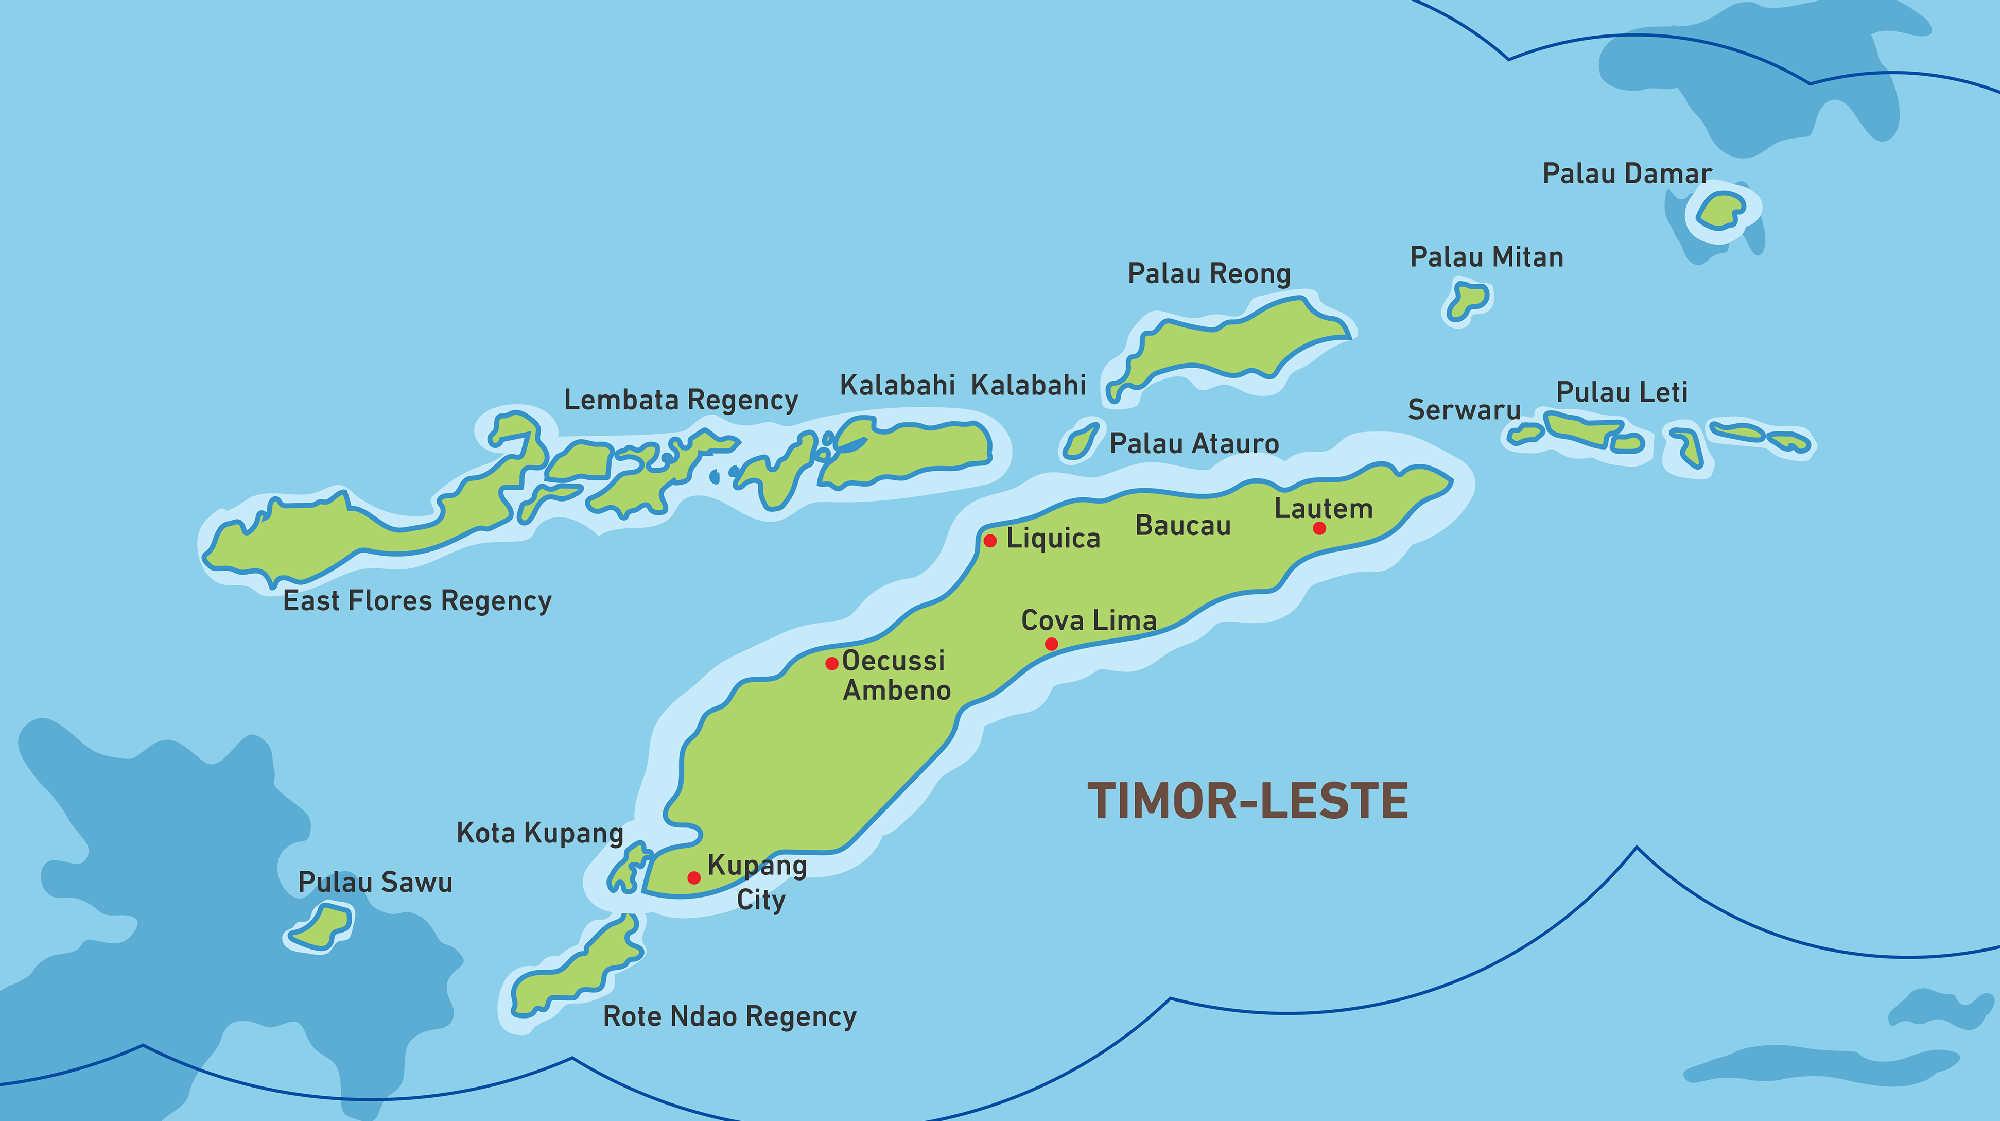 Map of Kacific 1 satellite coverage of timor-Leste